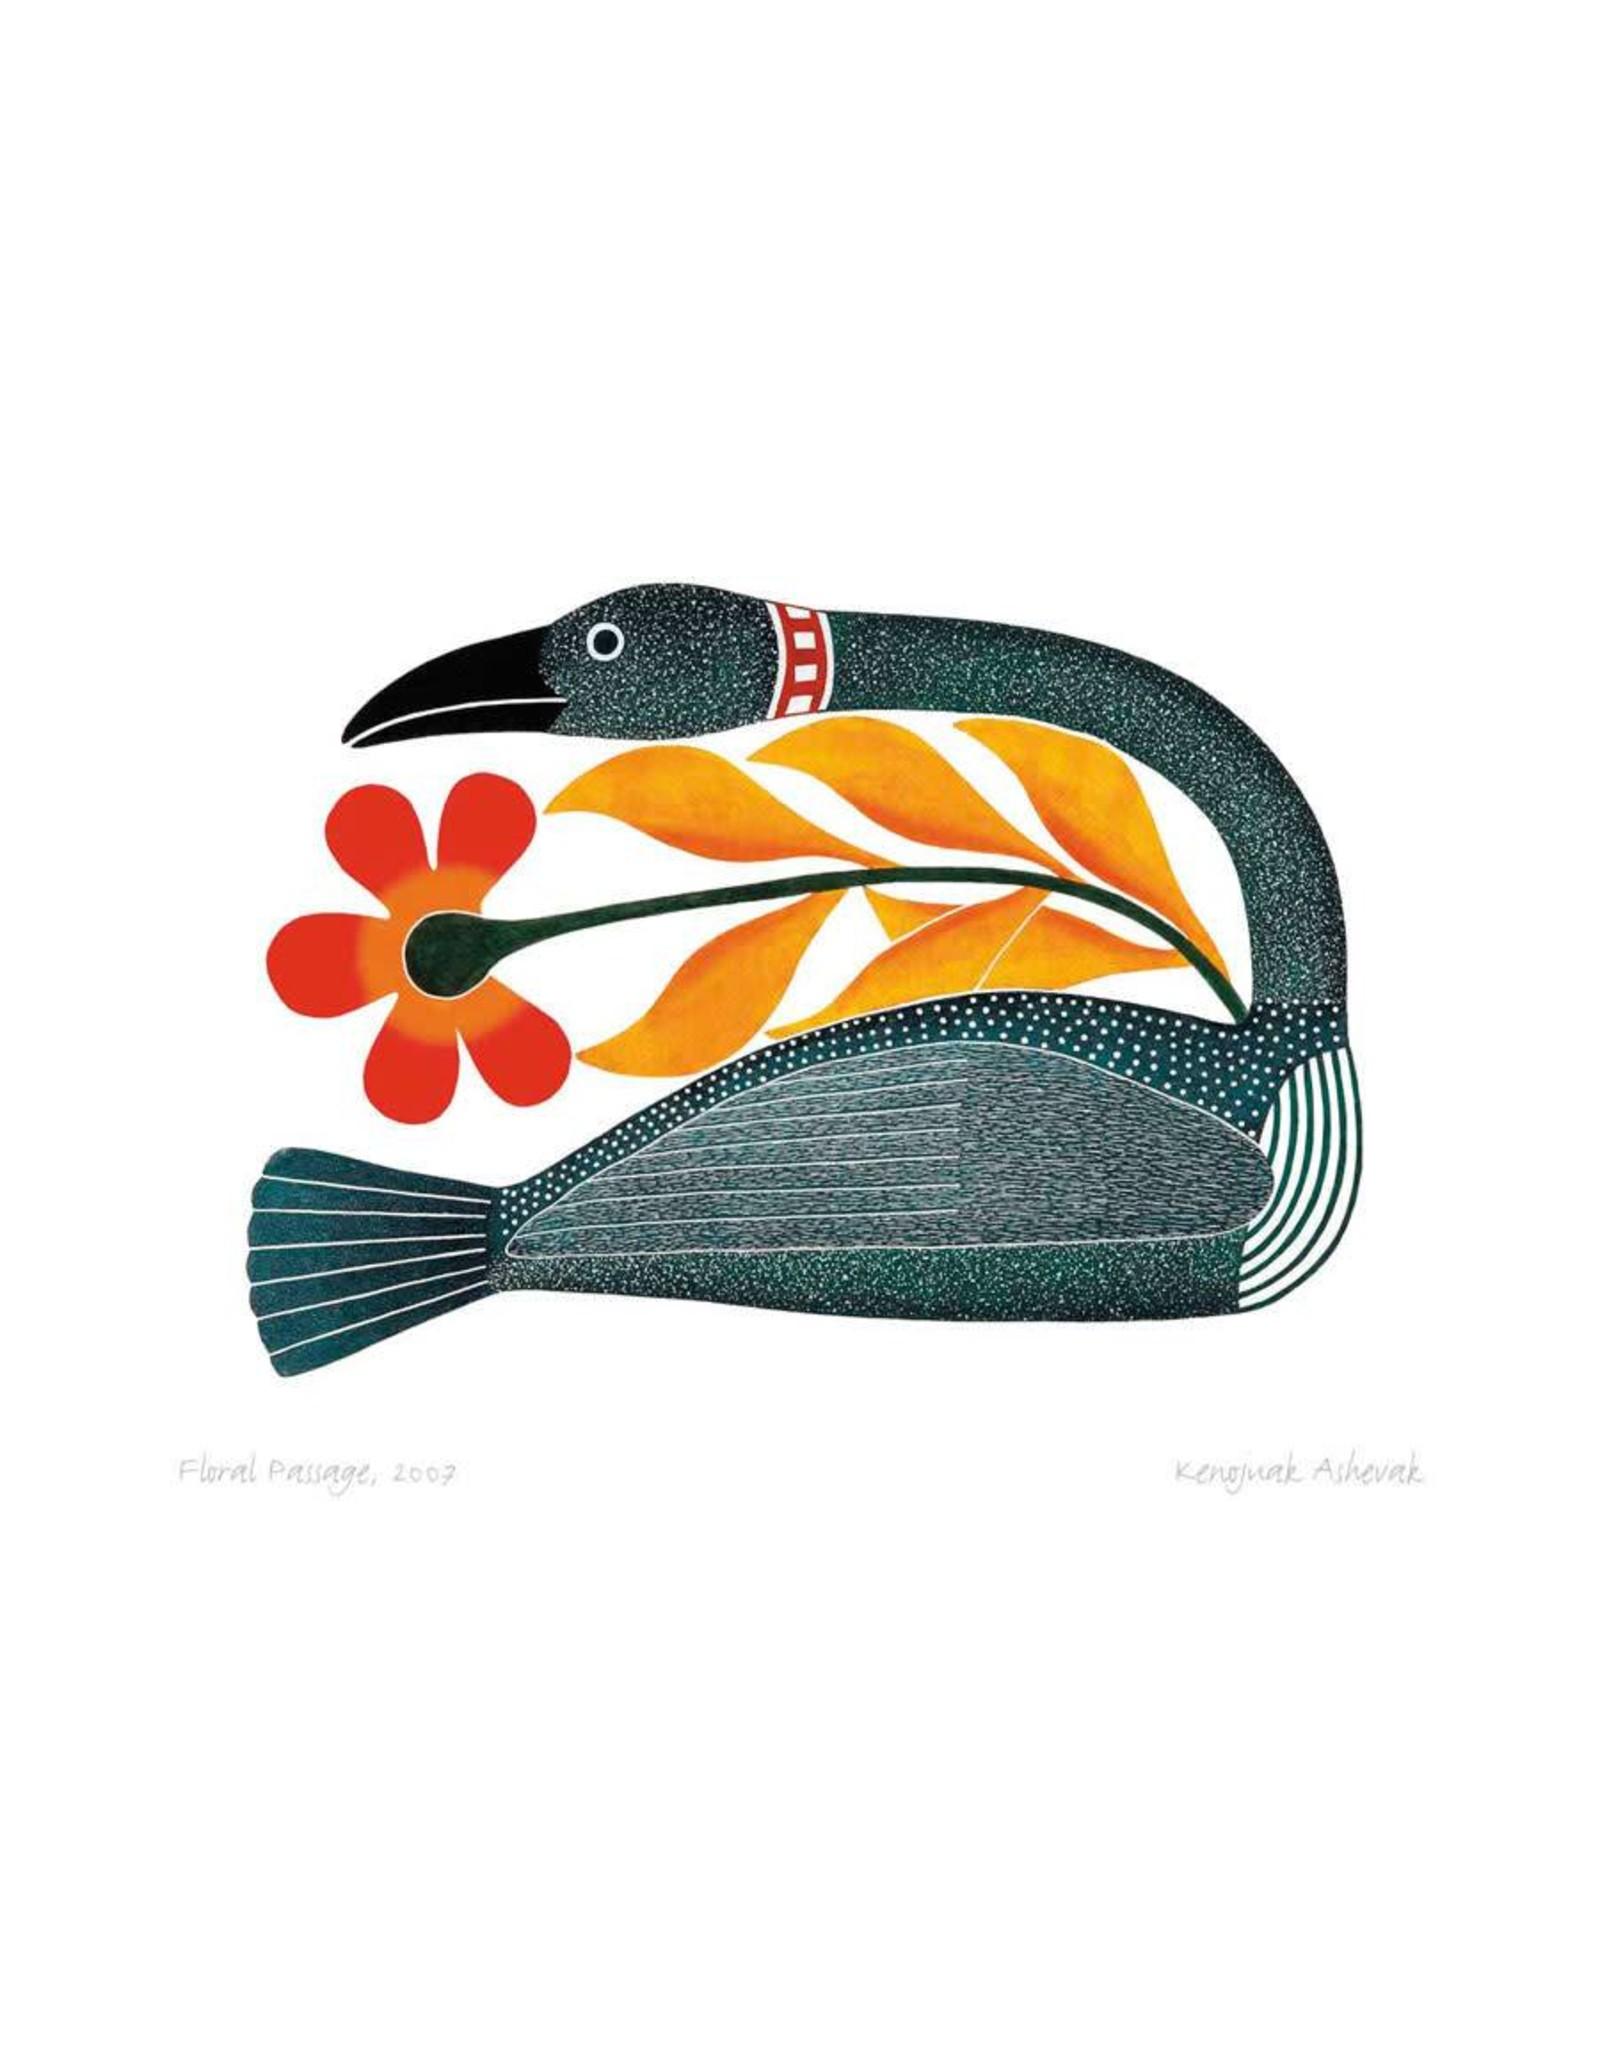 Floral Passage, 2007 by Kenojuak Ashevak Card